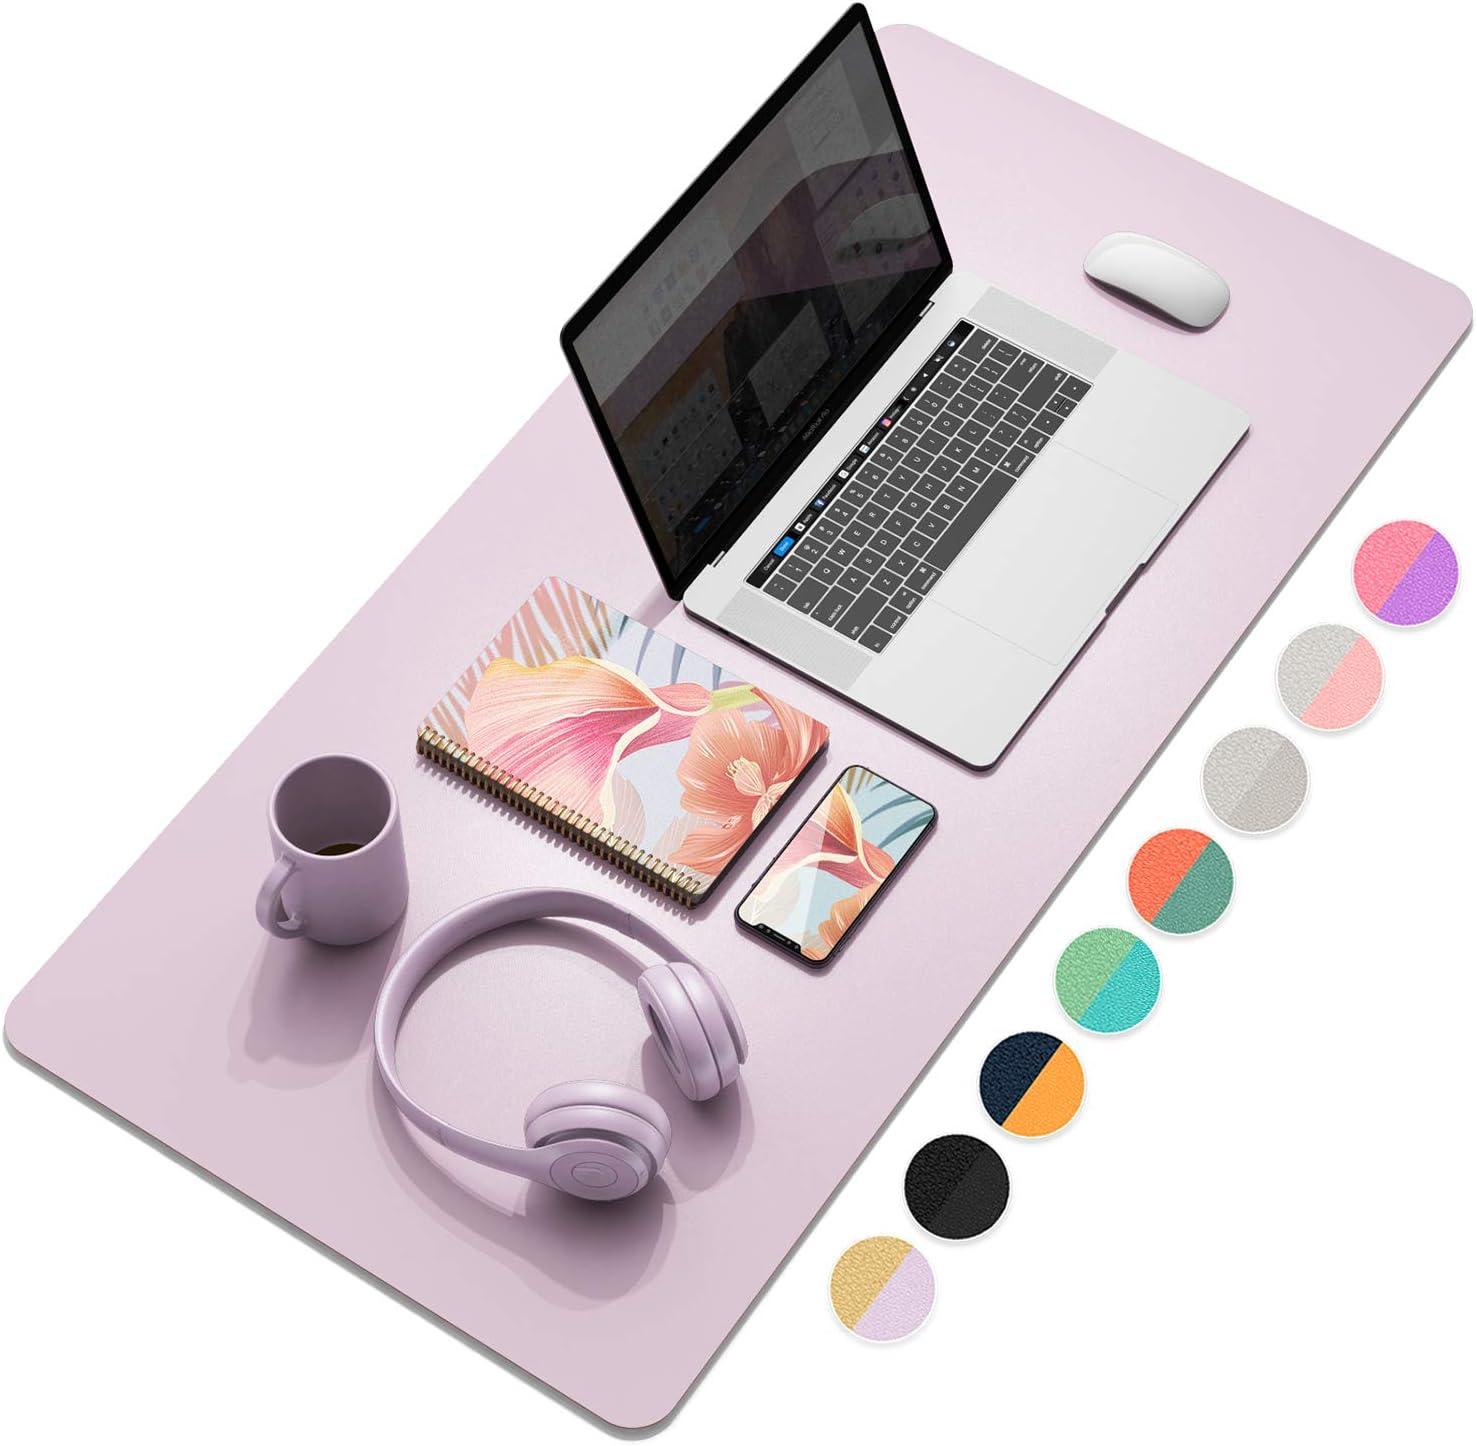 "YSAGi Multifunctional Office Desk Pad, Ultra Thin Waterproof PU Leather Mouse Pad, Dual Use Desk Writing Mat for Office/Home (35.4"" x 17"", Grayish Lavendar+Cinnamon Buff)"